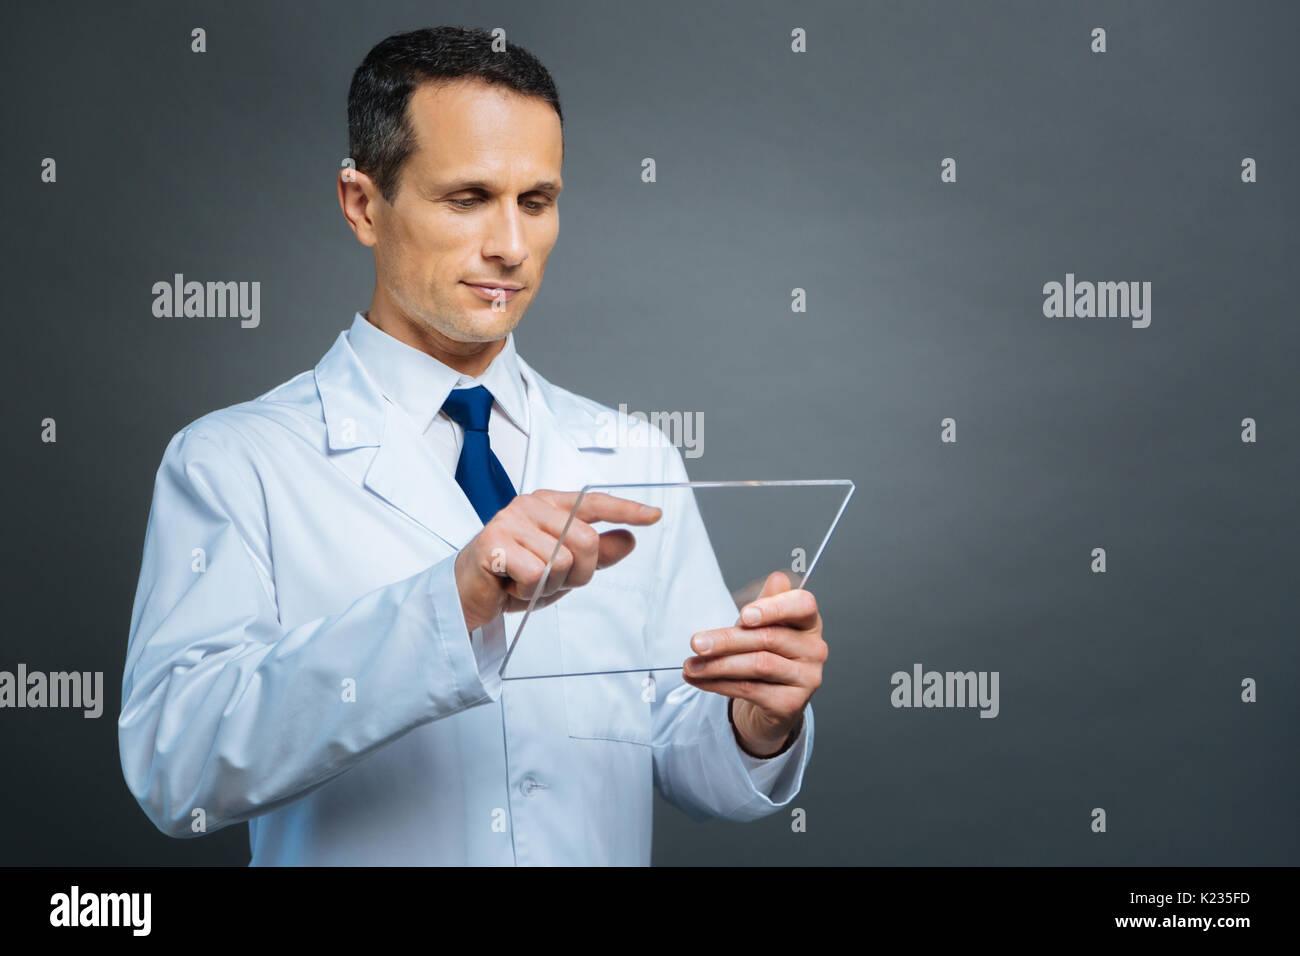 Serious medical working on transparent gadget - Stock Image